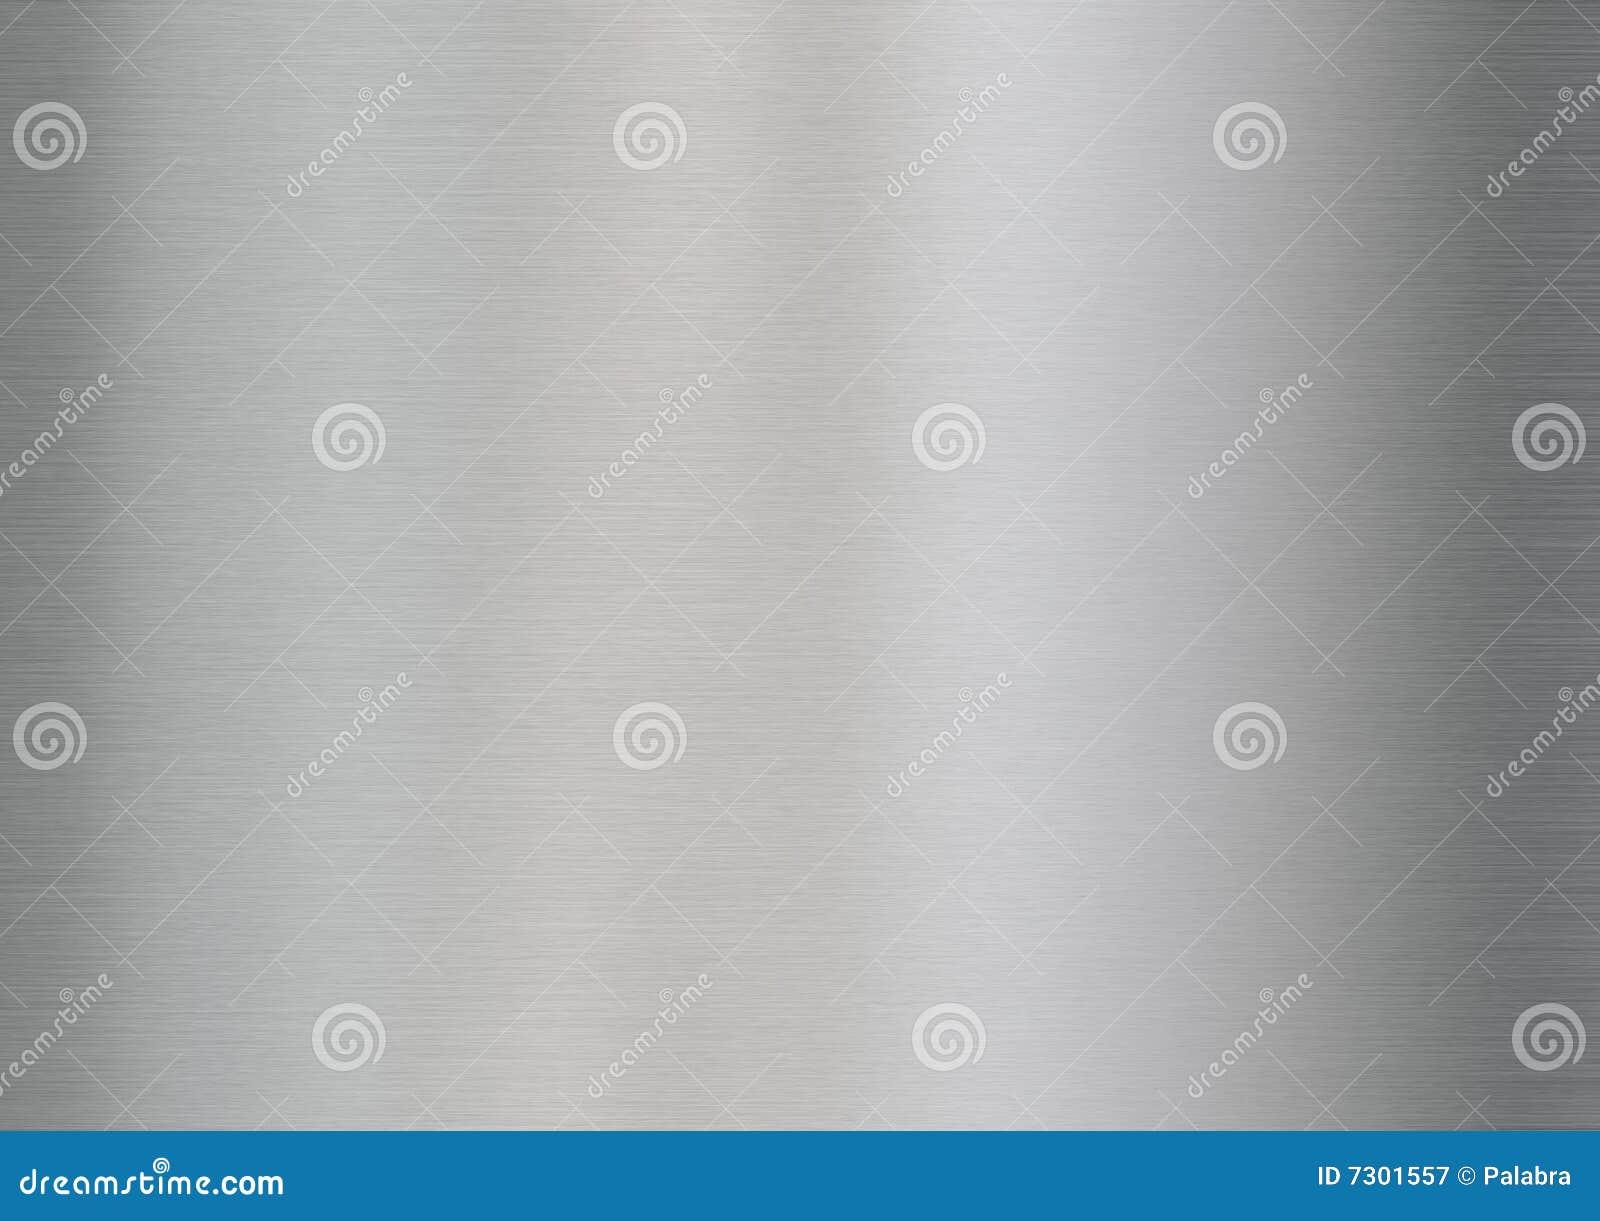 Brushed Steel - vertical